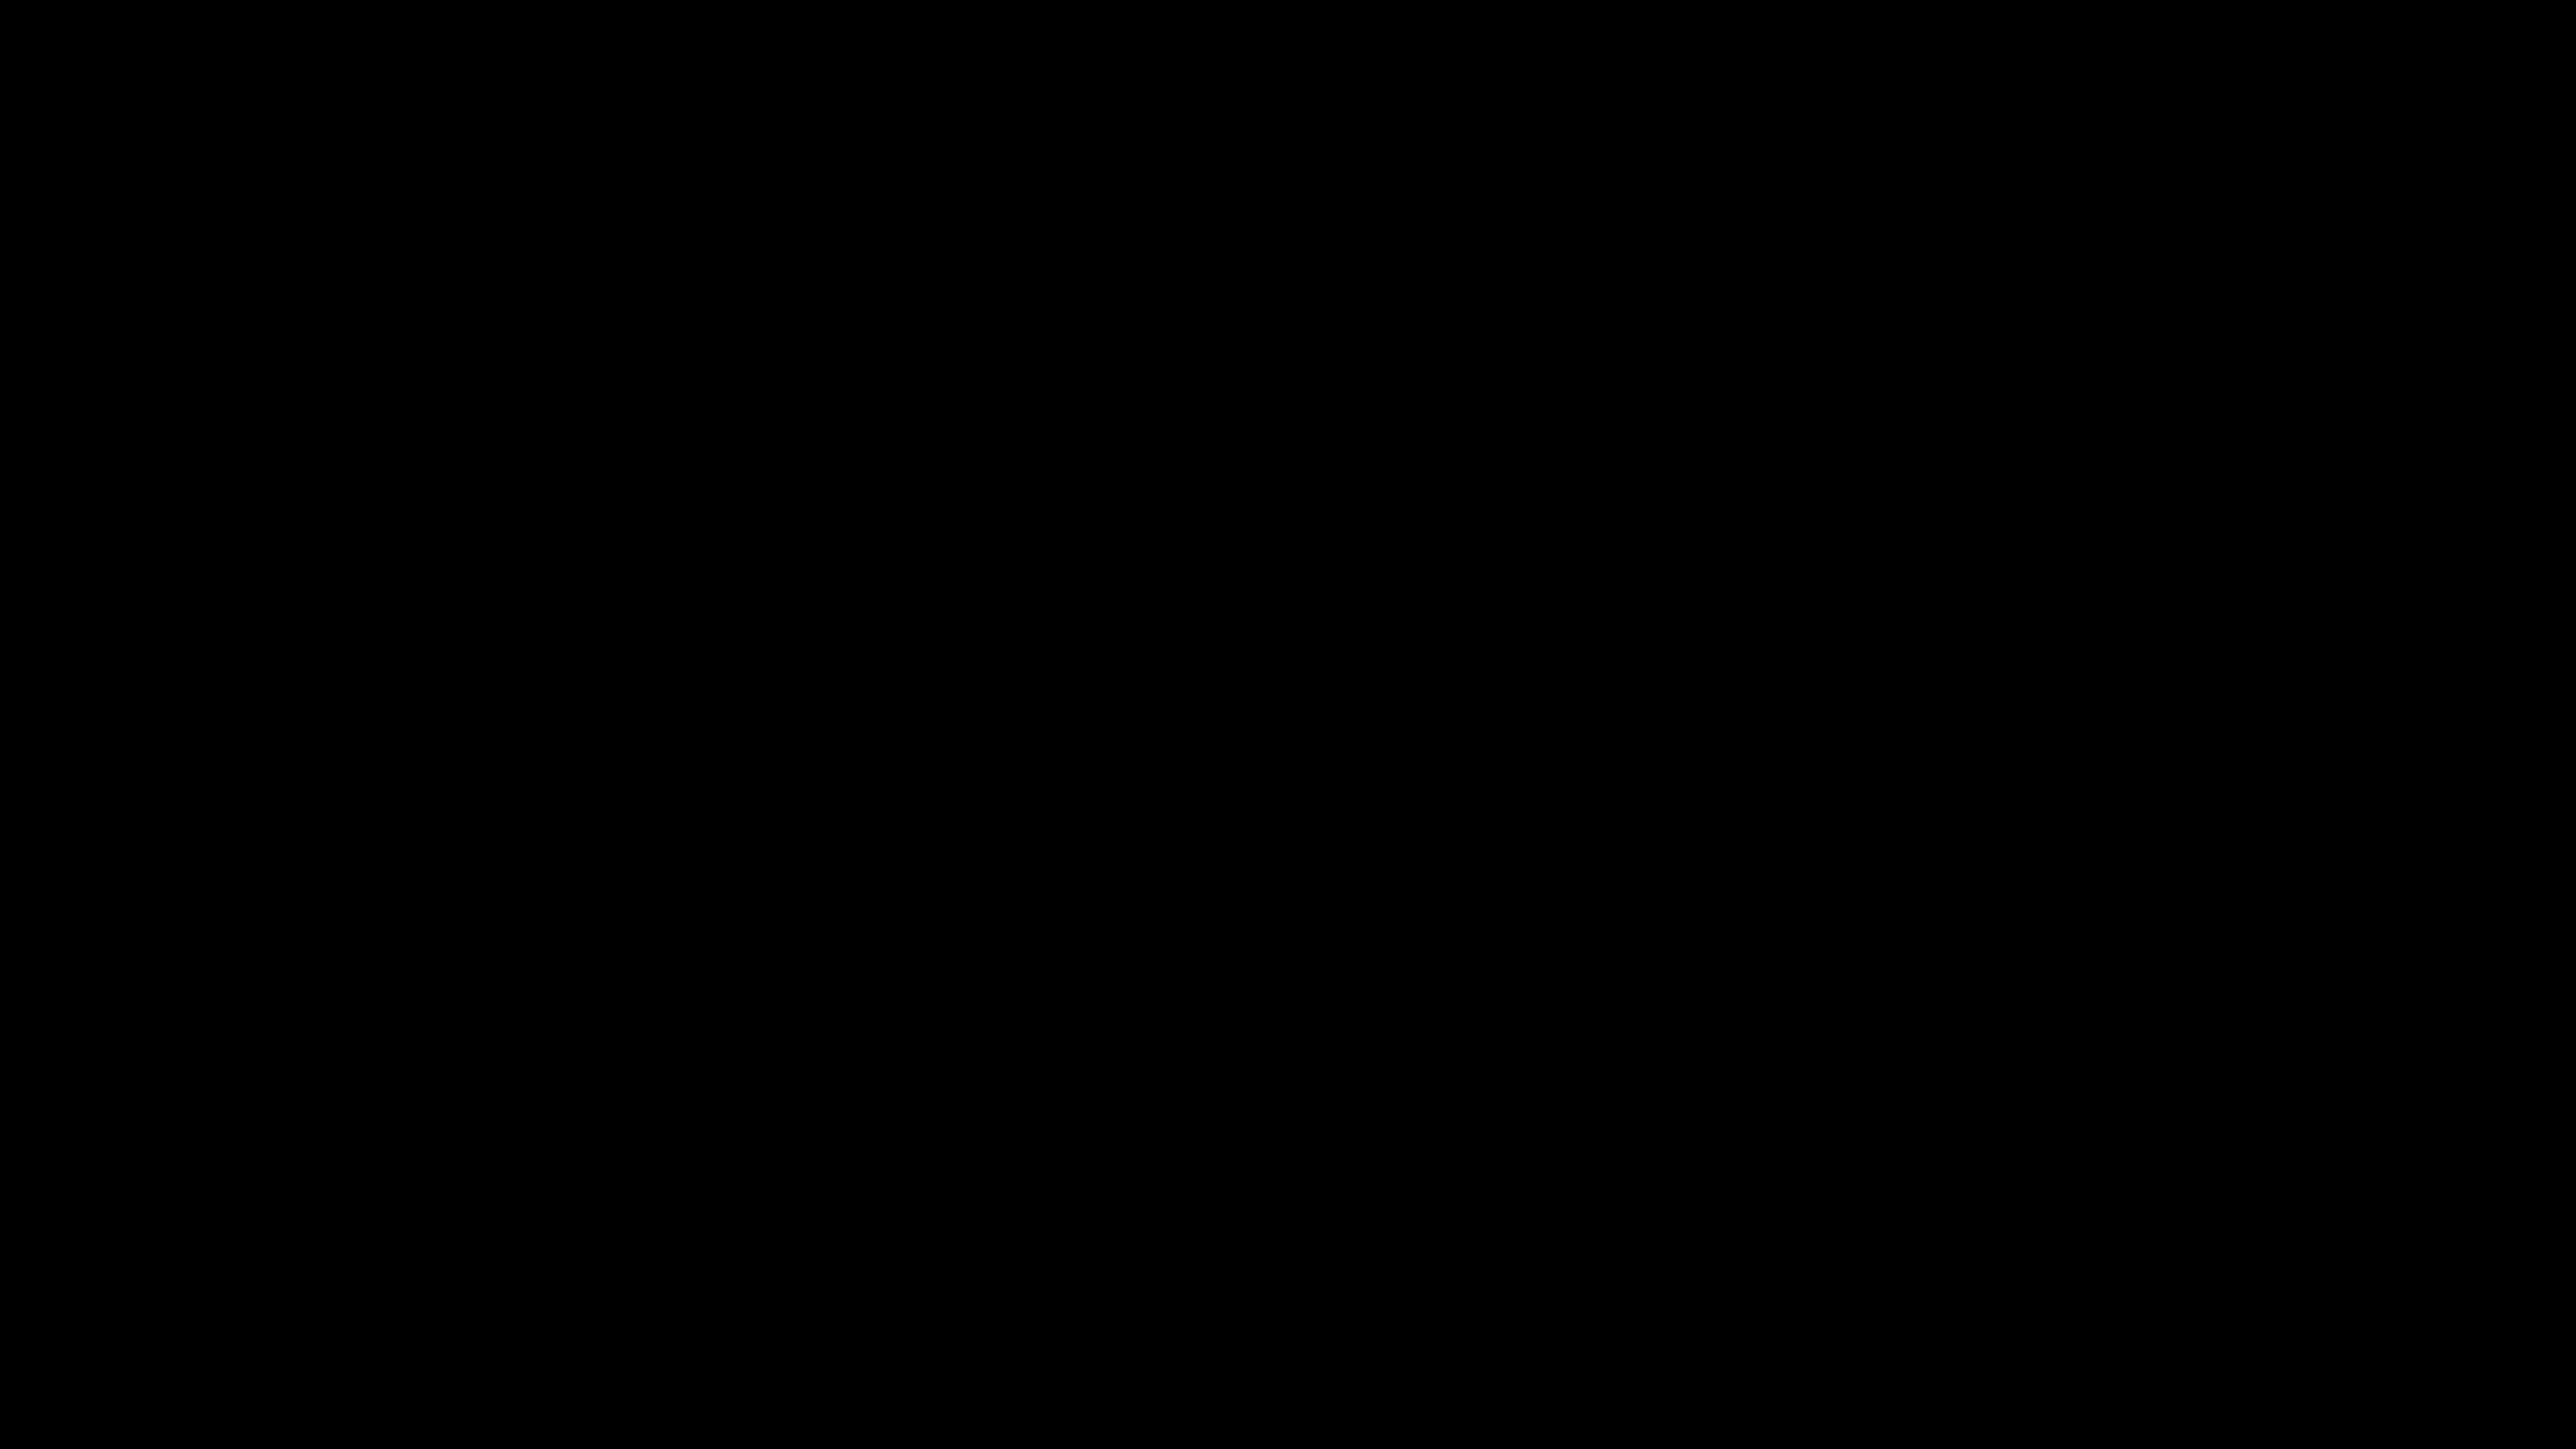 Megturney, celebs, watchitfortheplot, Meg Turney in 'The Eleven Little Roosters Teaser Trailer' GIFs